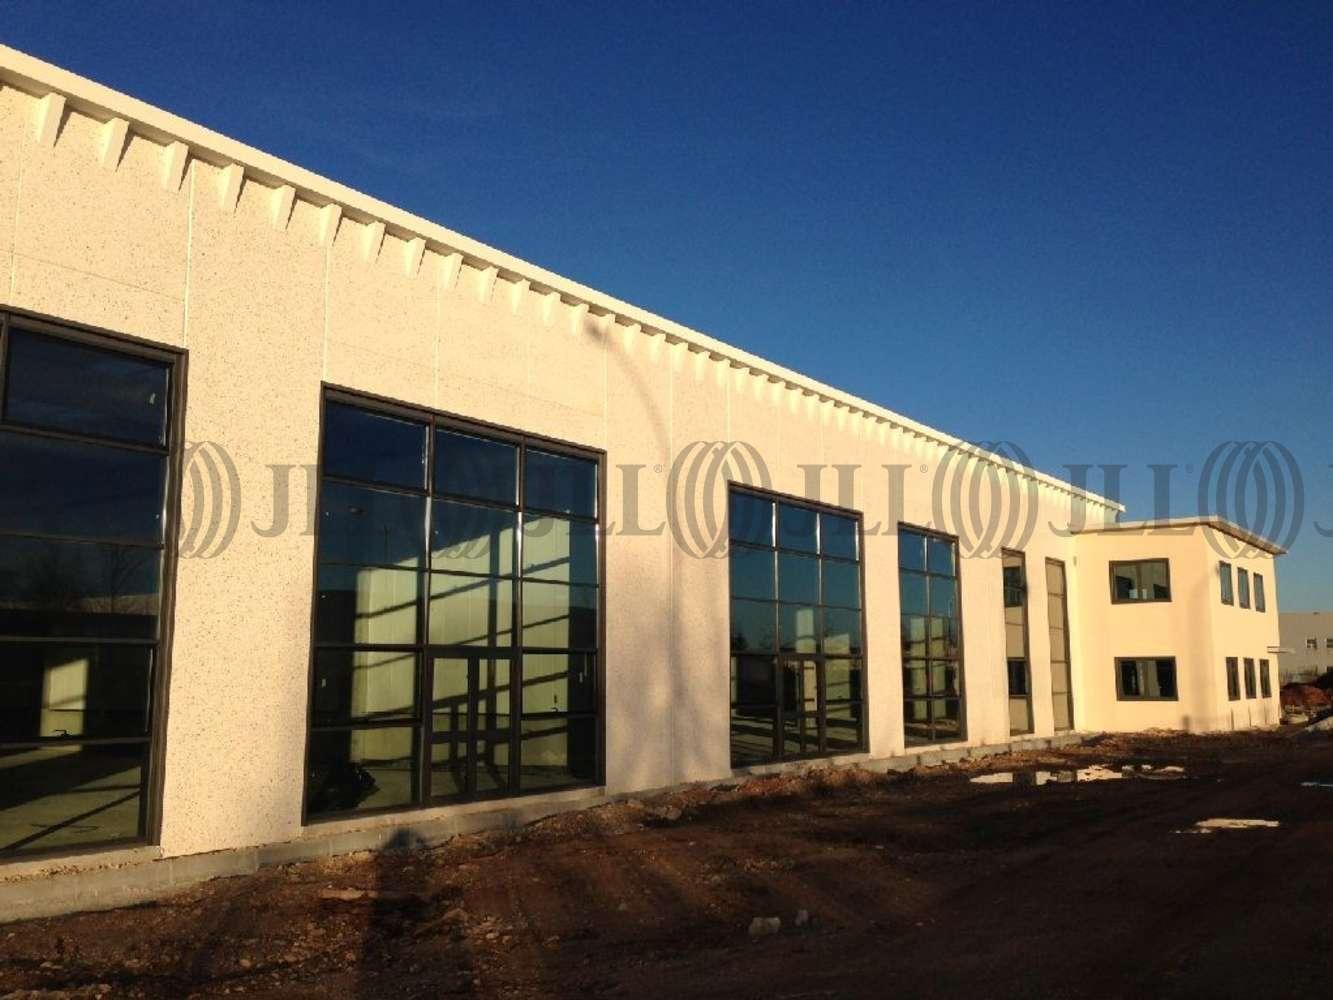 Activités/entrepôt Meyzieu, 69330 - Location locaux d'activité Meyzieu Lyon - 10067004